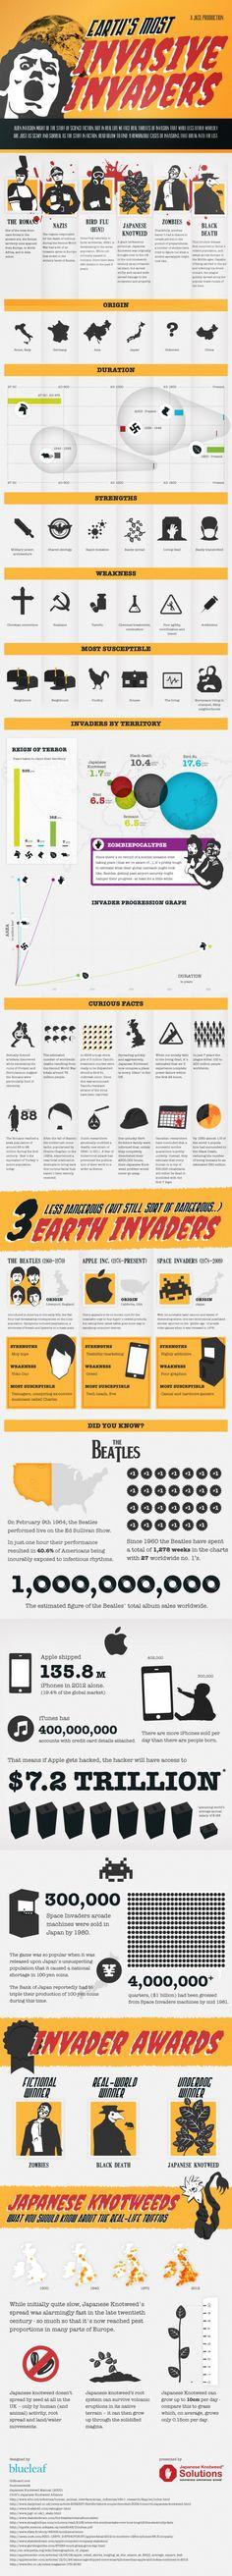 Invasive Invaders #socialmedia #infographic #infographics